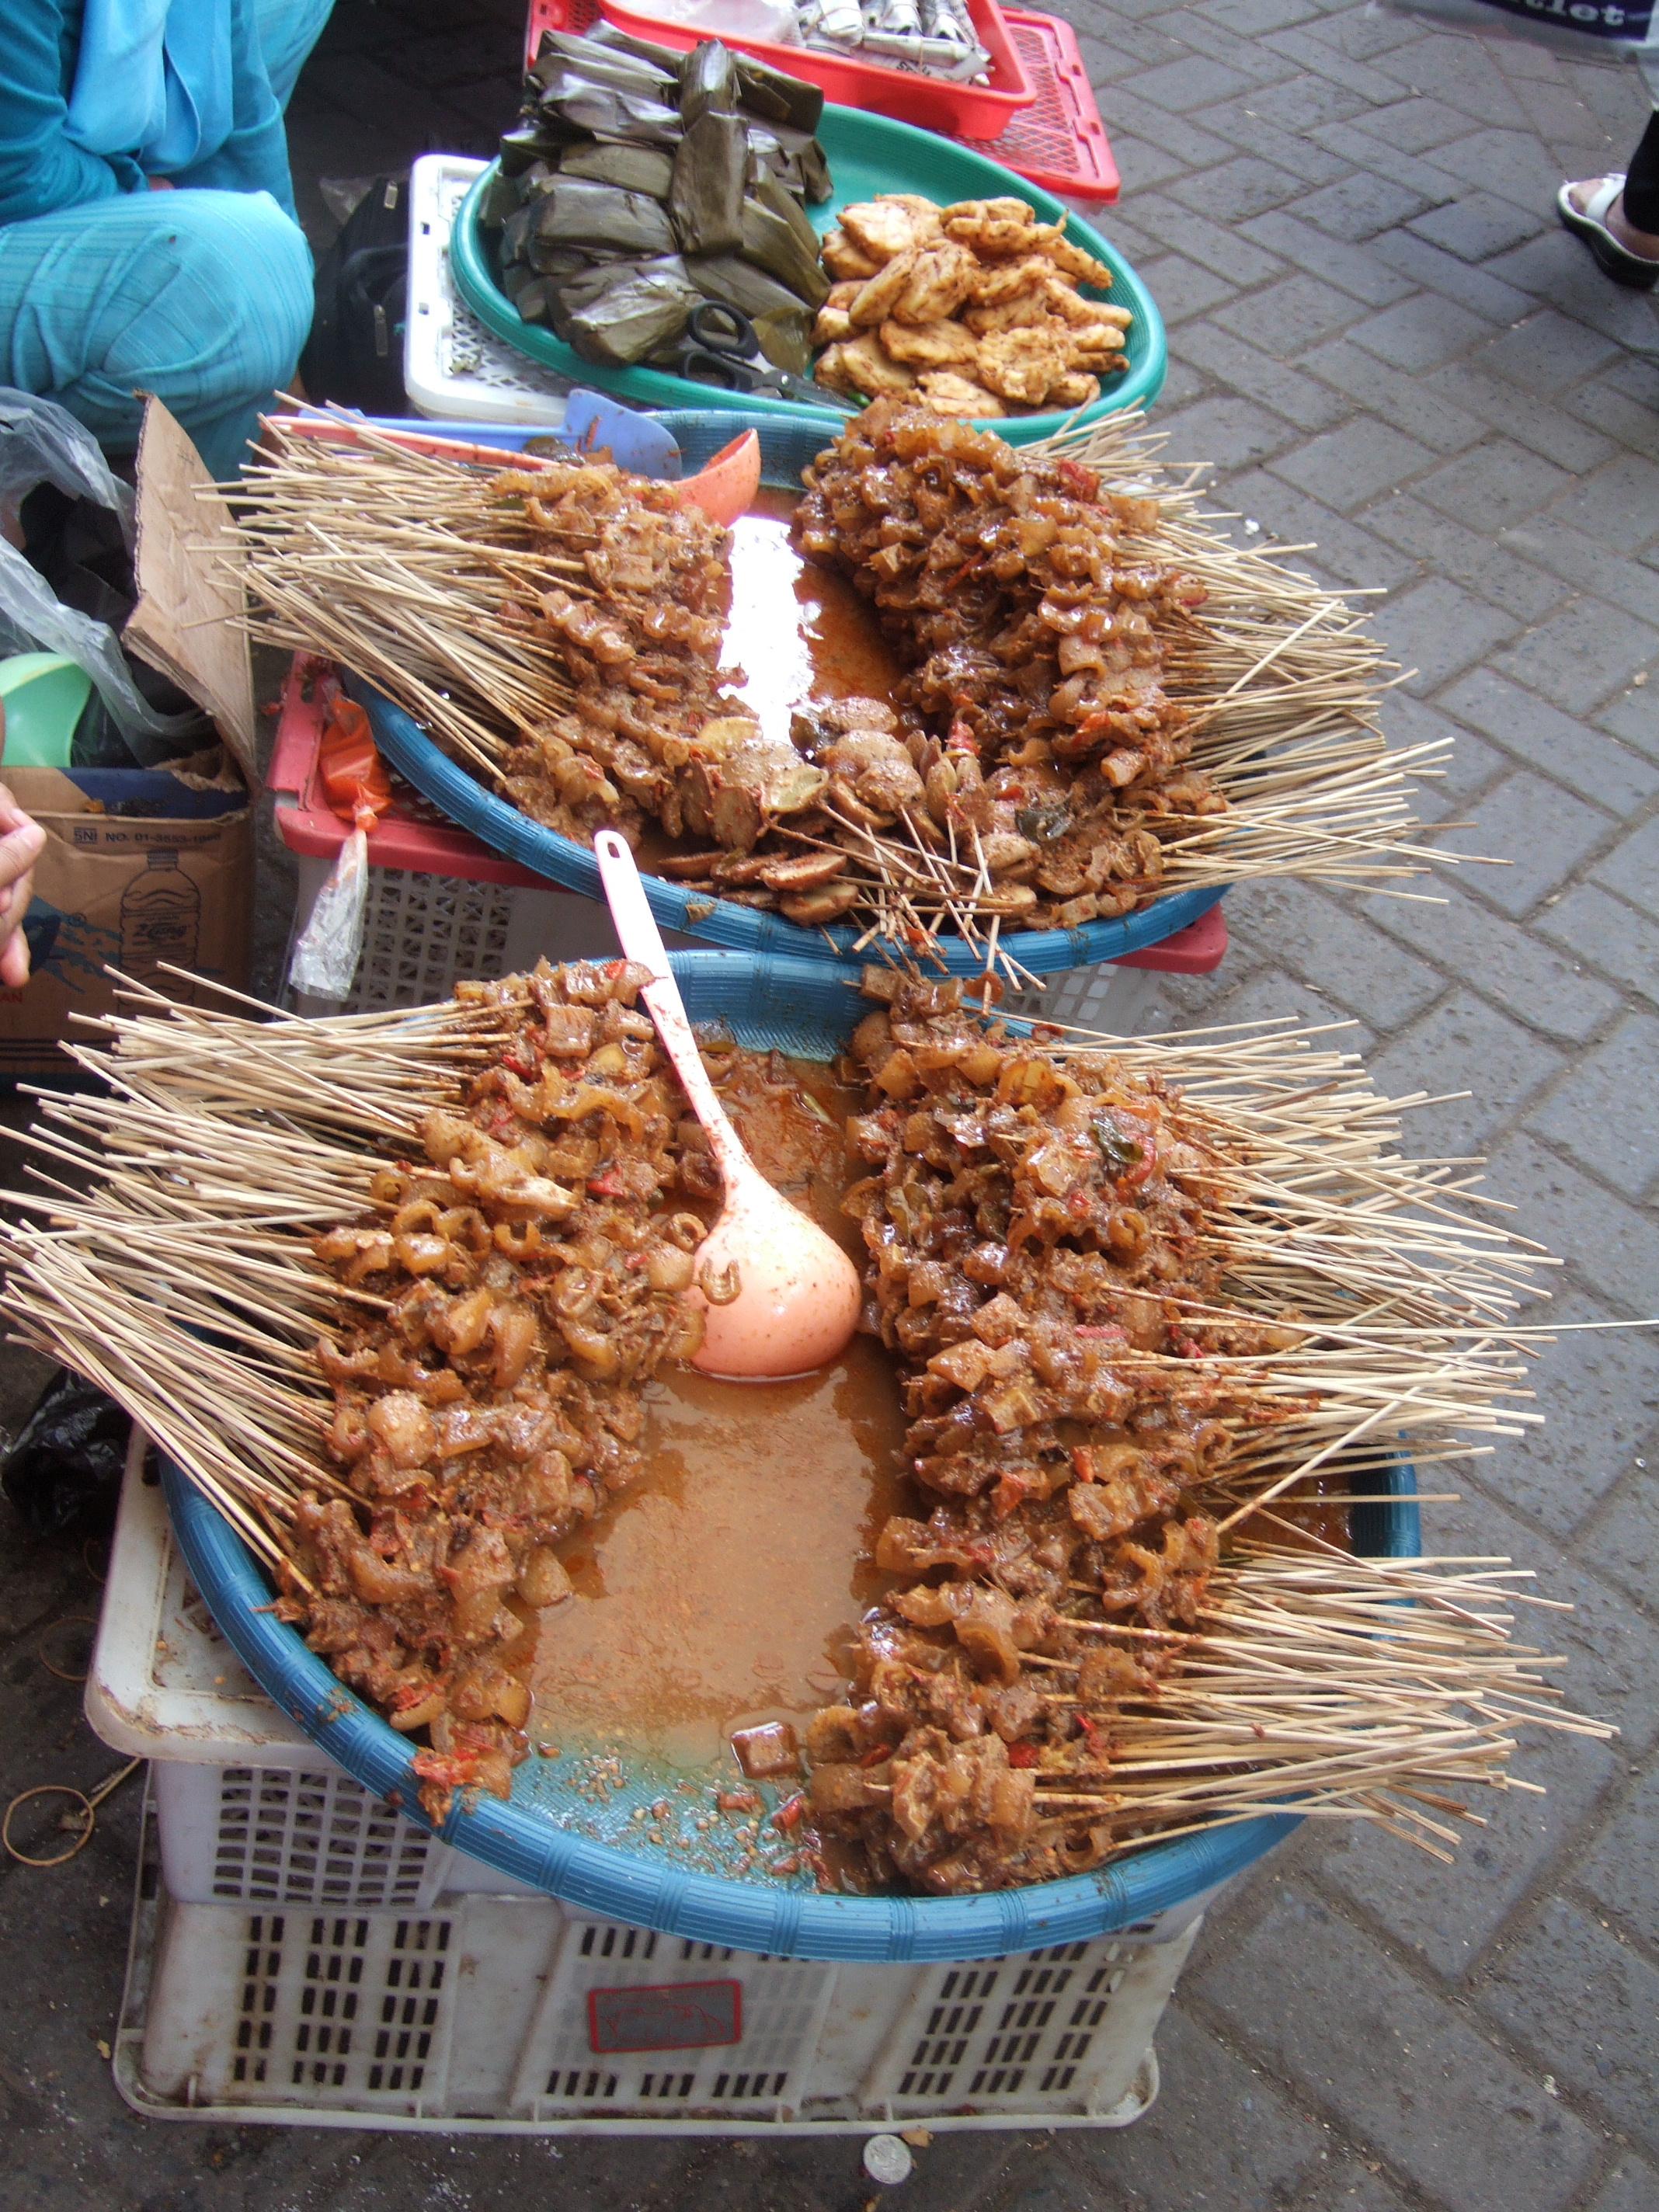 File:Sate kikil Pasar Baru.JPG - Wikimedia Commonskikil ru